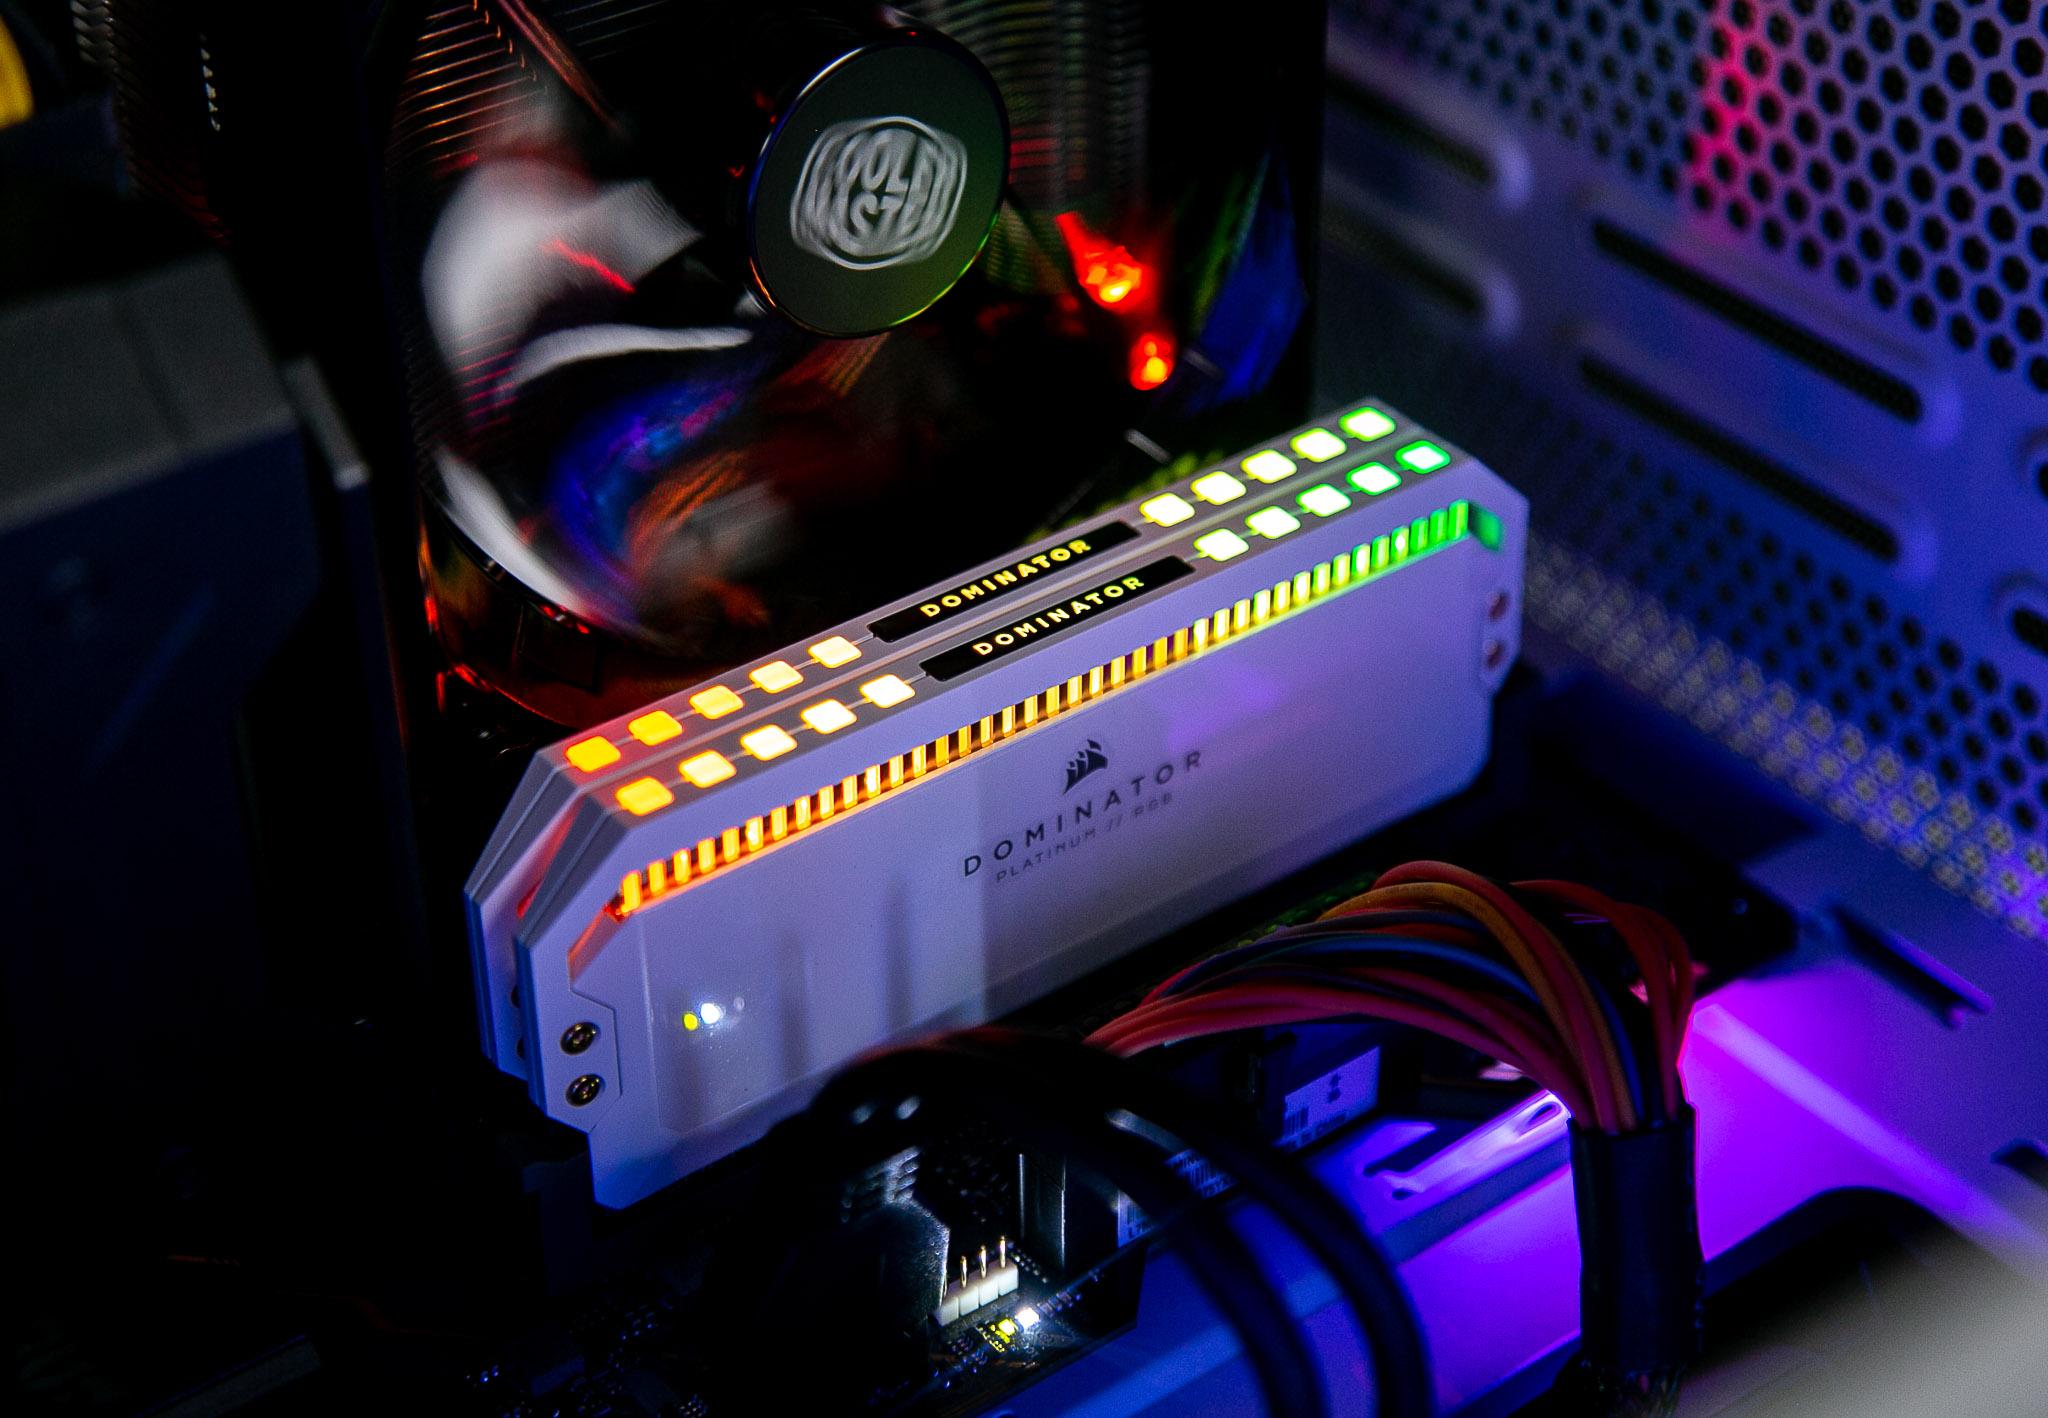 Ram Desktop Corsair Dominator Platinum White RGB (CMT32GX4M2C3200C16W) 32GB  (2x16G) DDR4 3200MHz